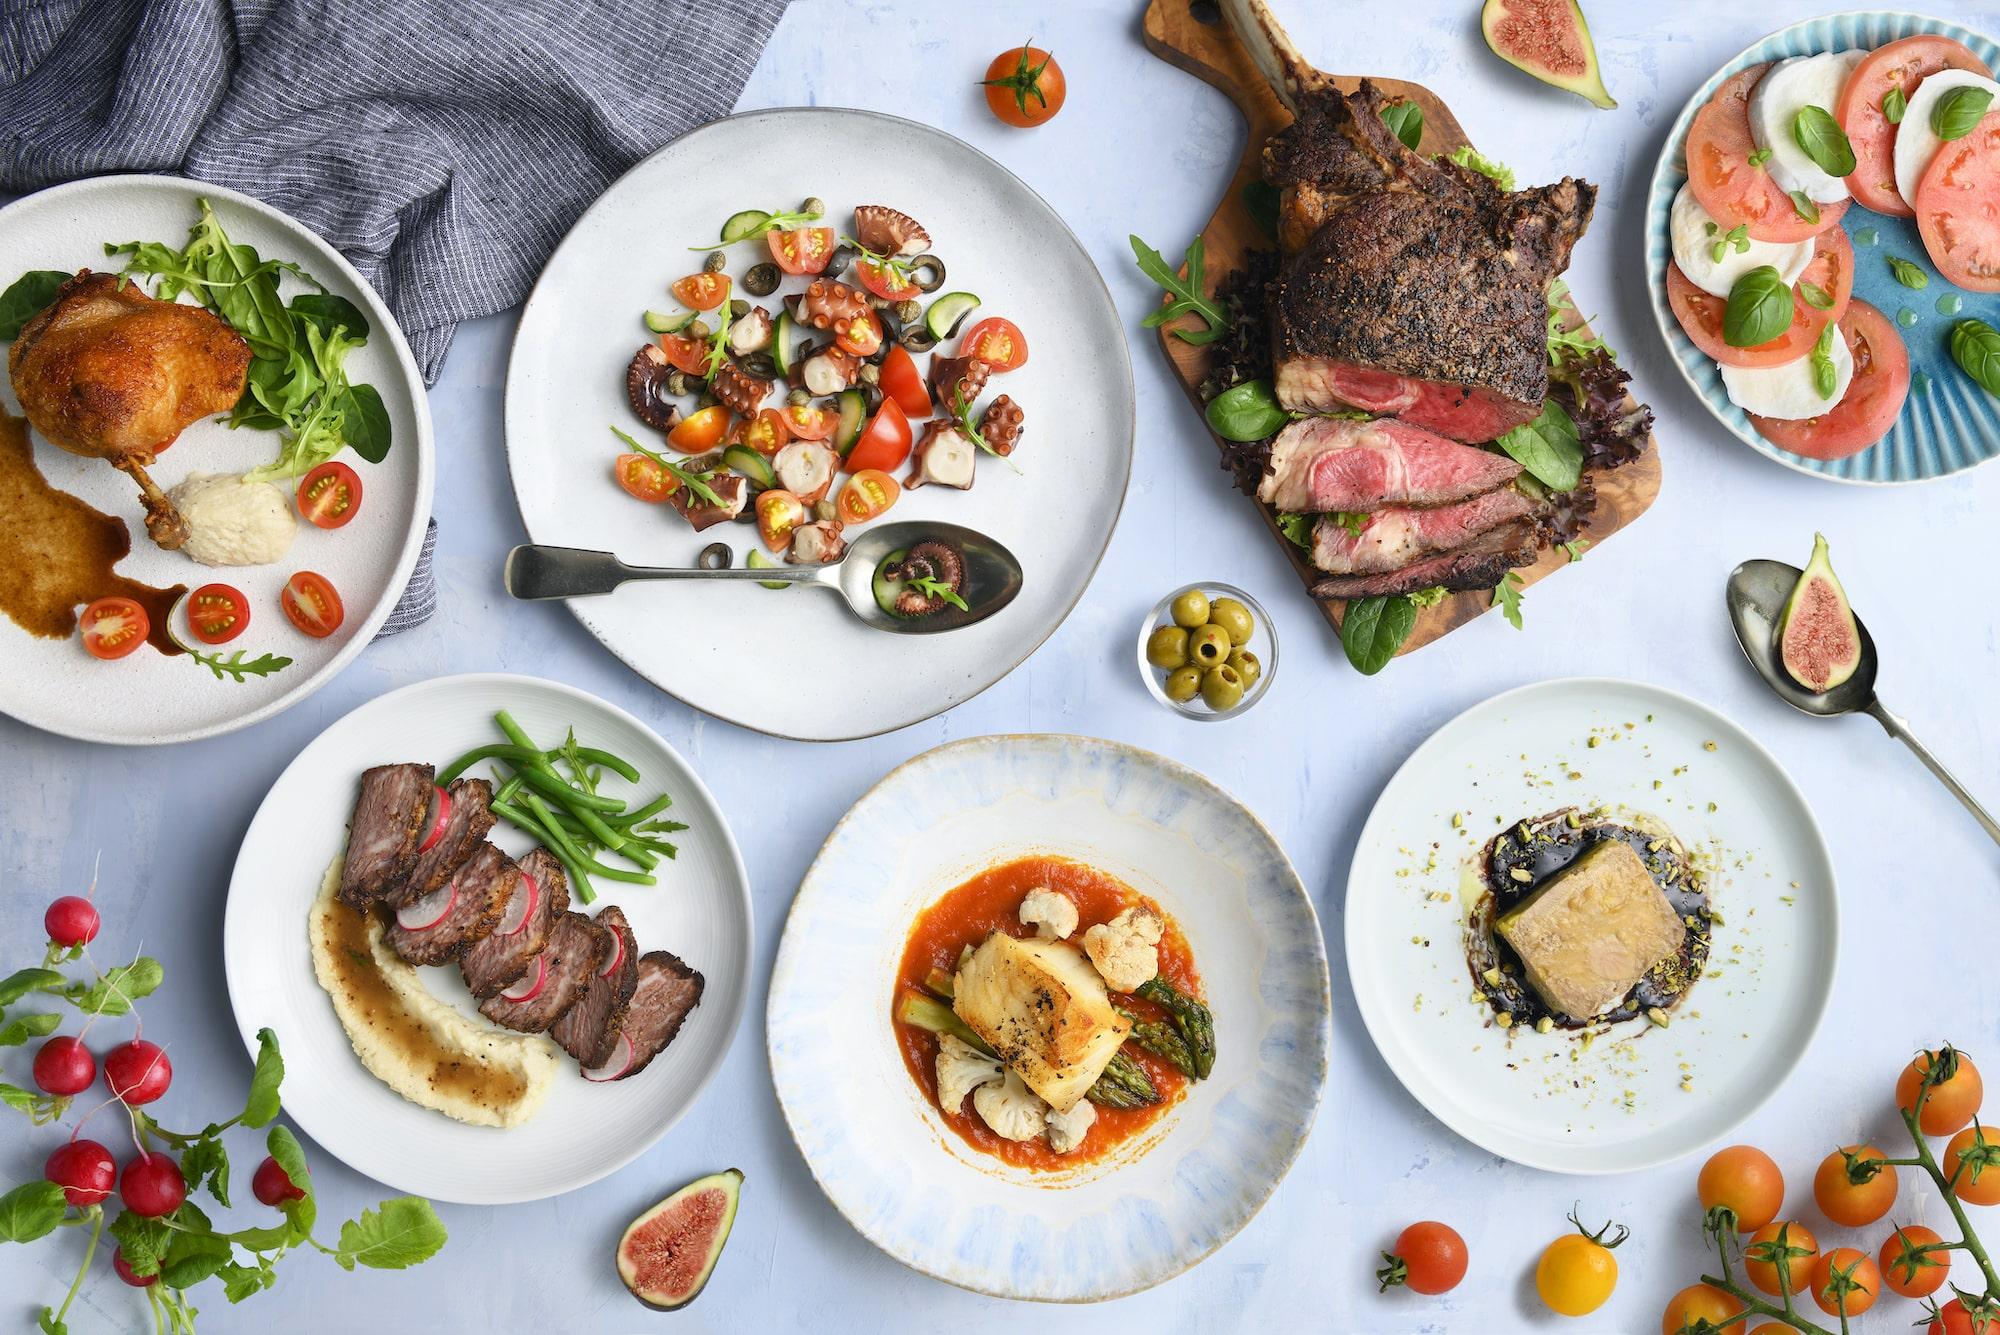 keto friendly food singapore online